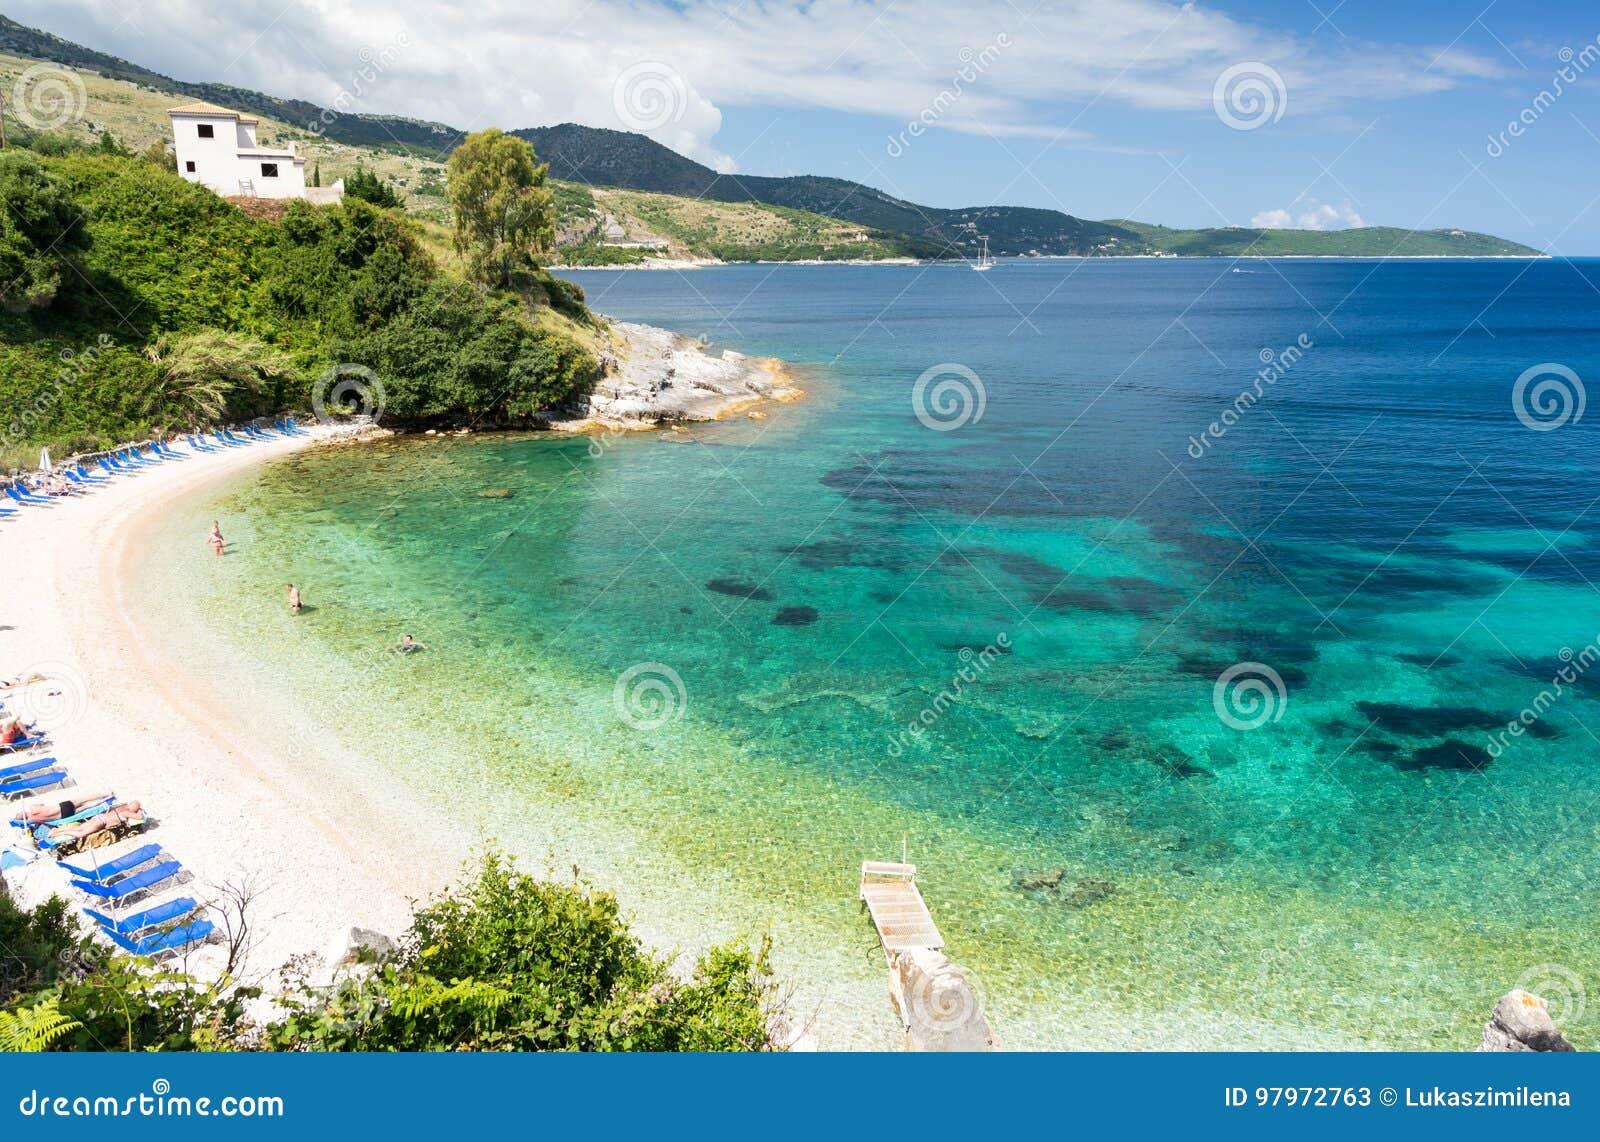 Paradise Beach In Kassiopi In Corfu Island, Greece Stock Photo 97972763 -  Megapixl